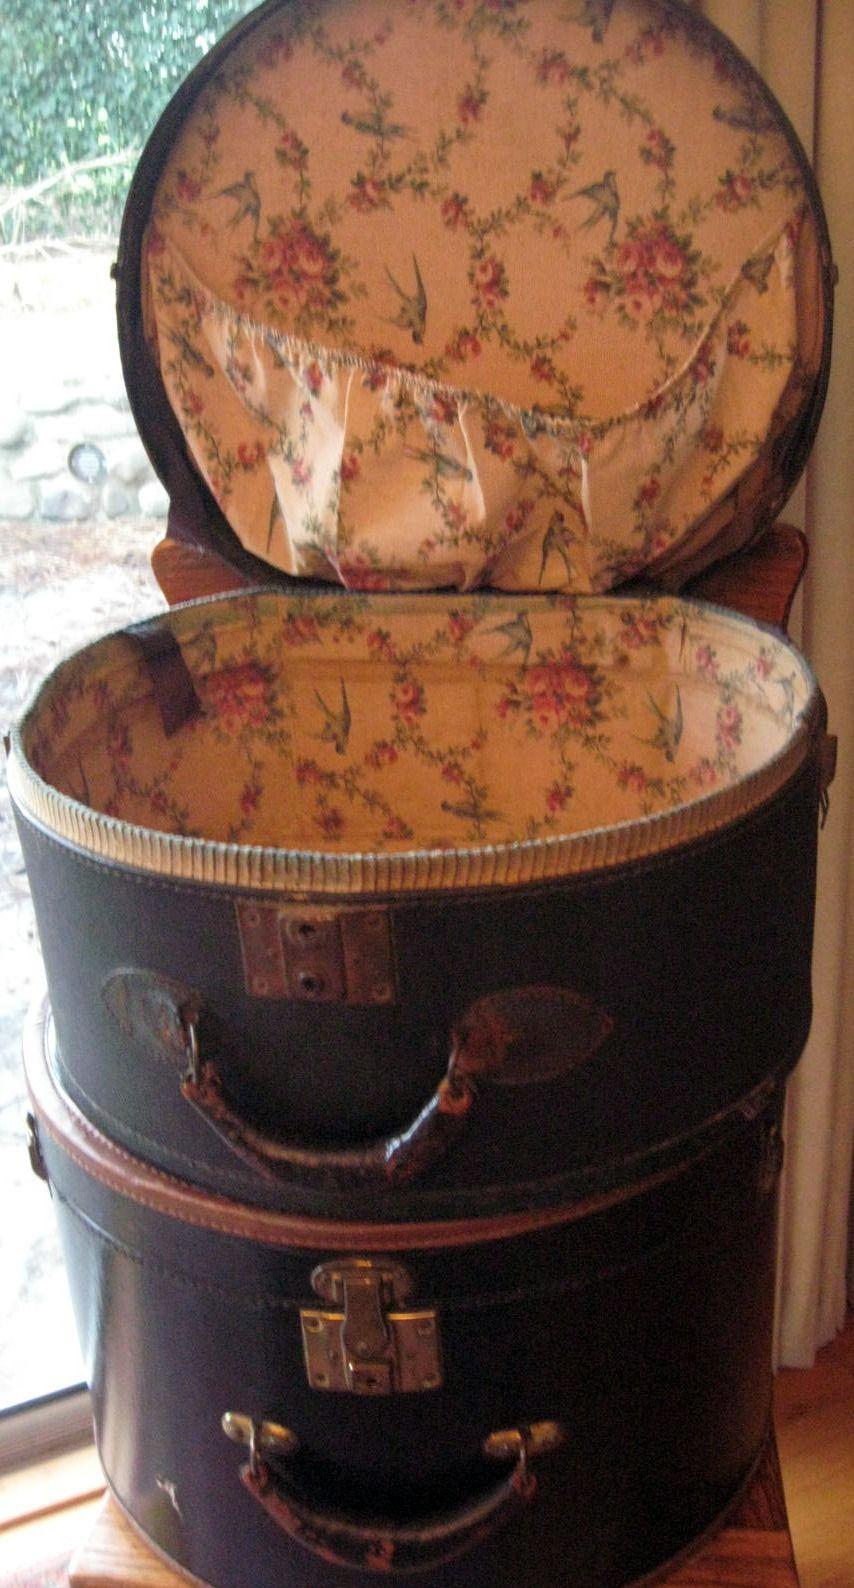 Vintage Fabric Lined Train Hat Case Vintage Hat Boxes Vintage Suitcases Old Suitcases